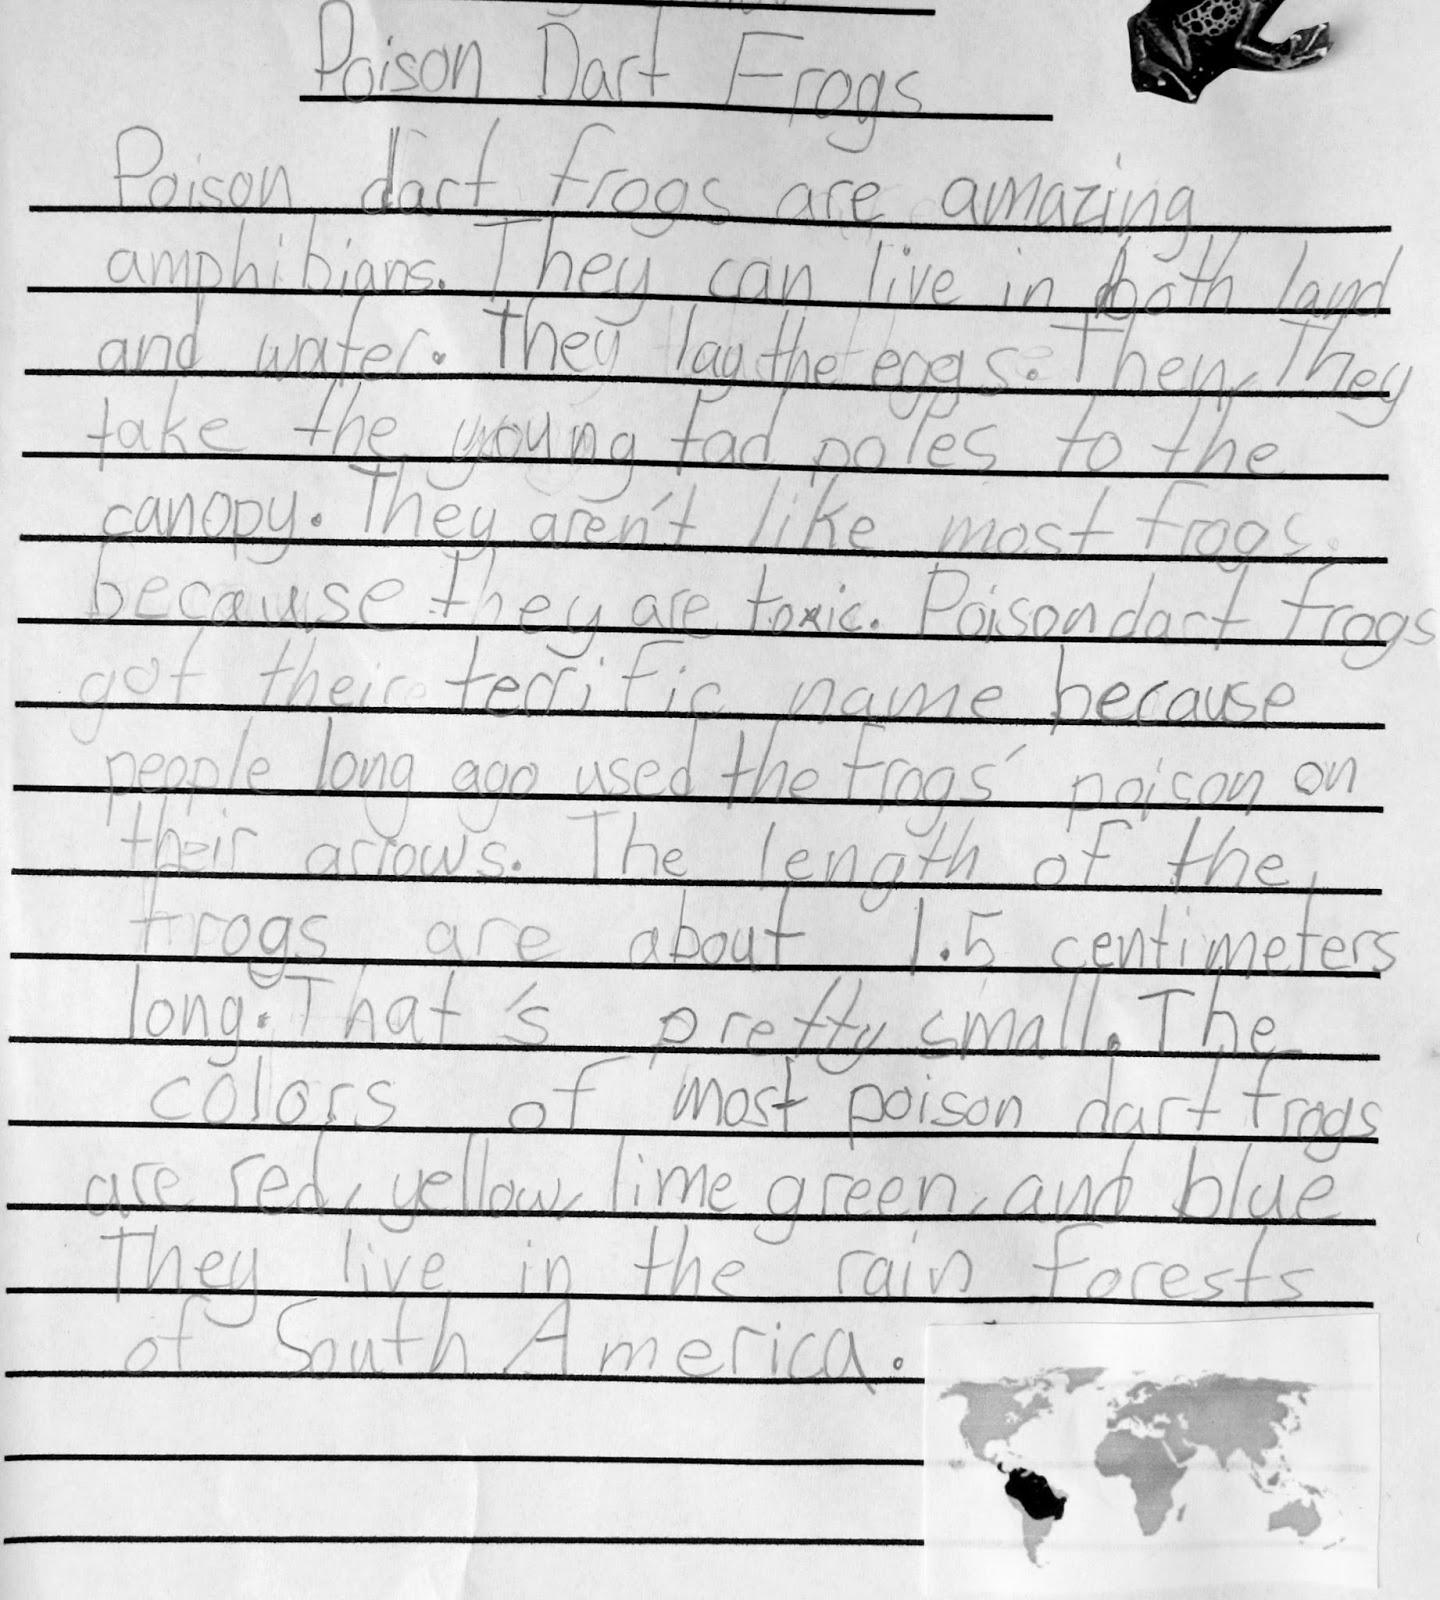 Ecce writing essay